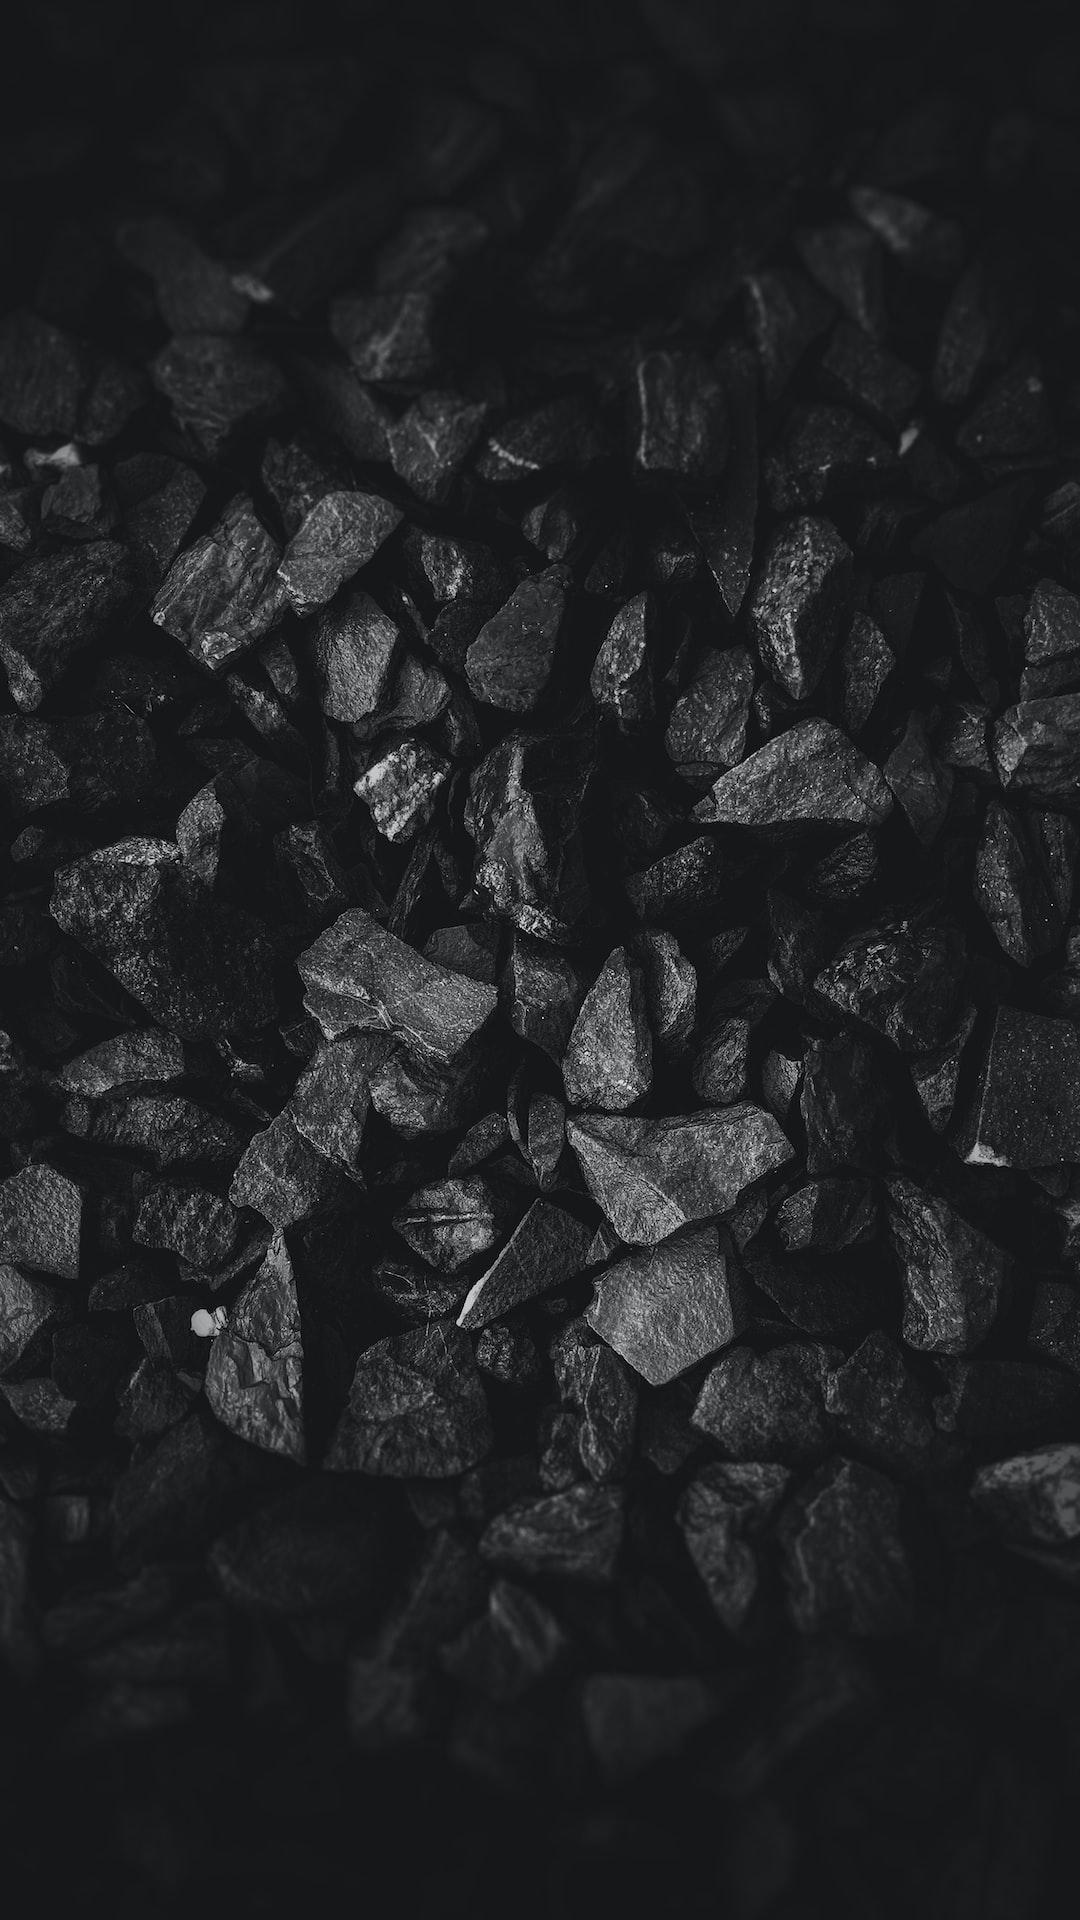 900 Black Background Download HD Backgrounds on